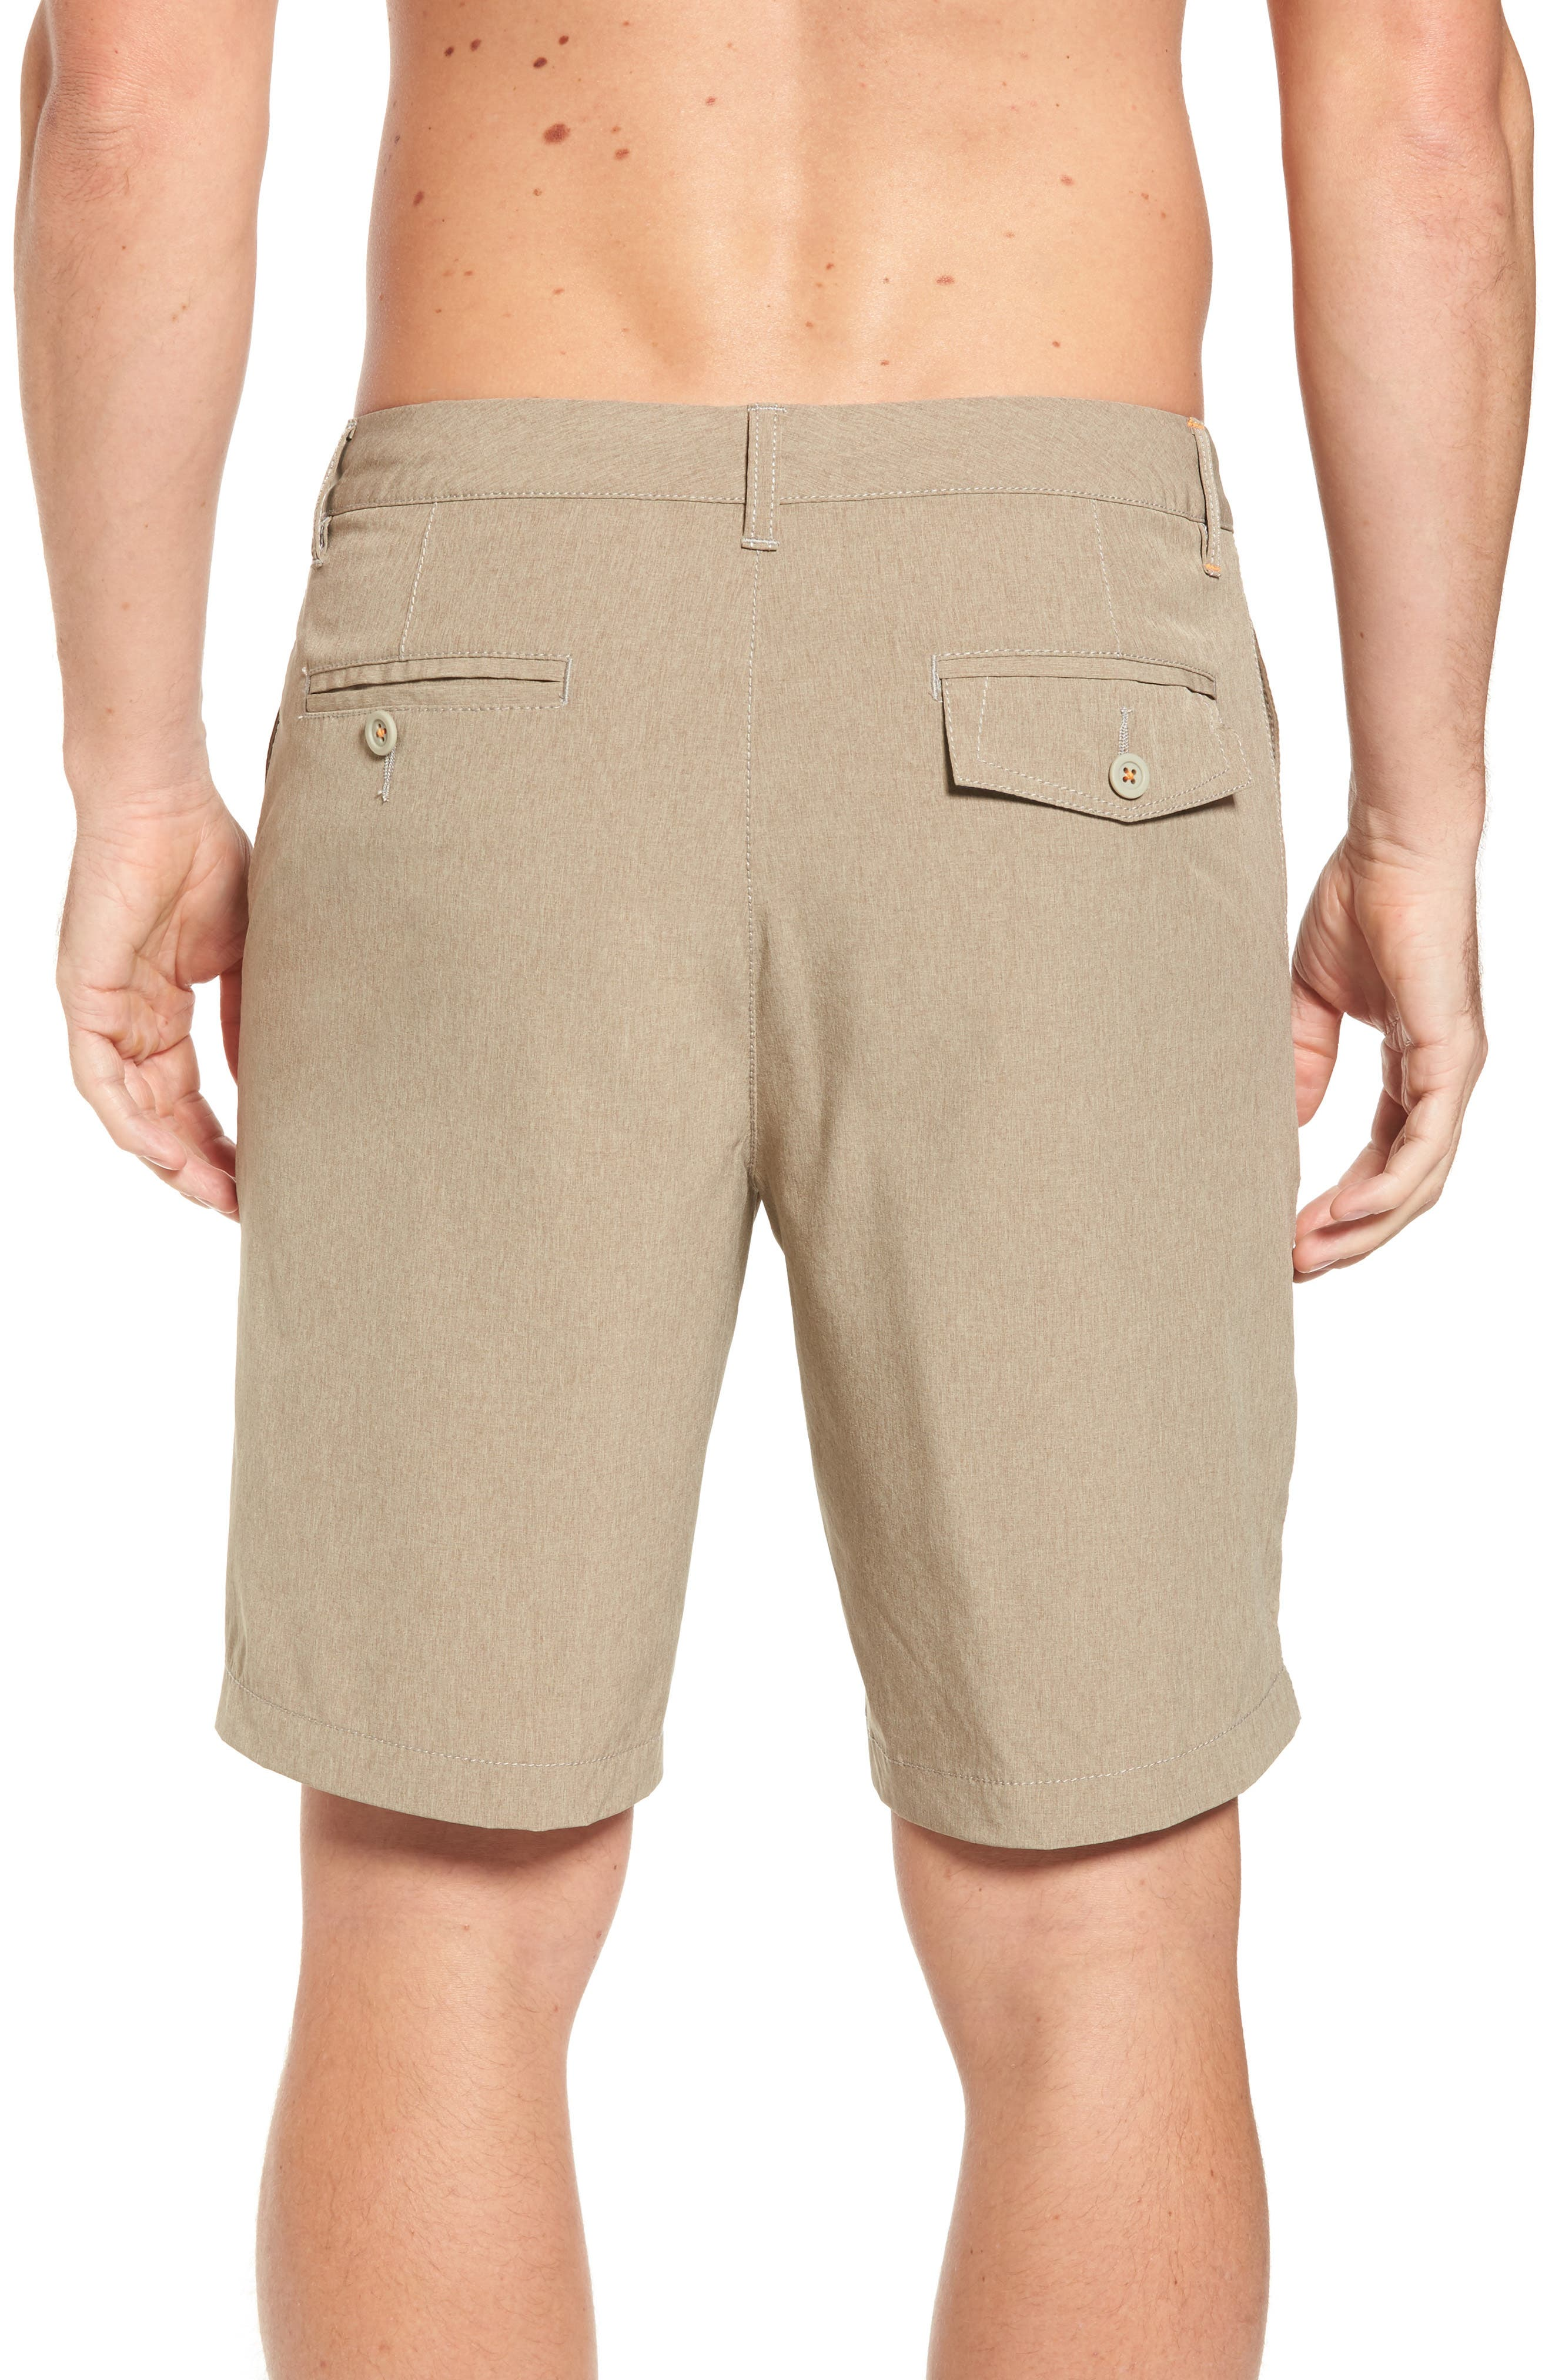 'Cayman Isles' Hybrid Swim Shorts,                             Alternate thumbnail 2, color,                             Dark Twill